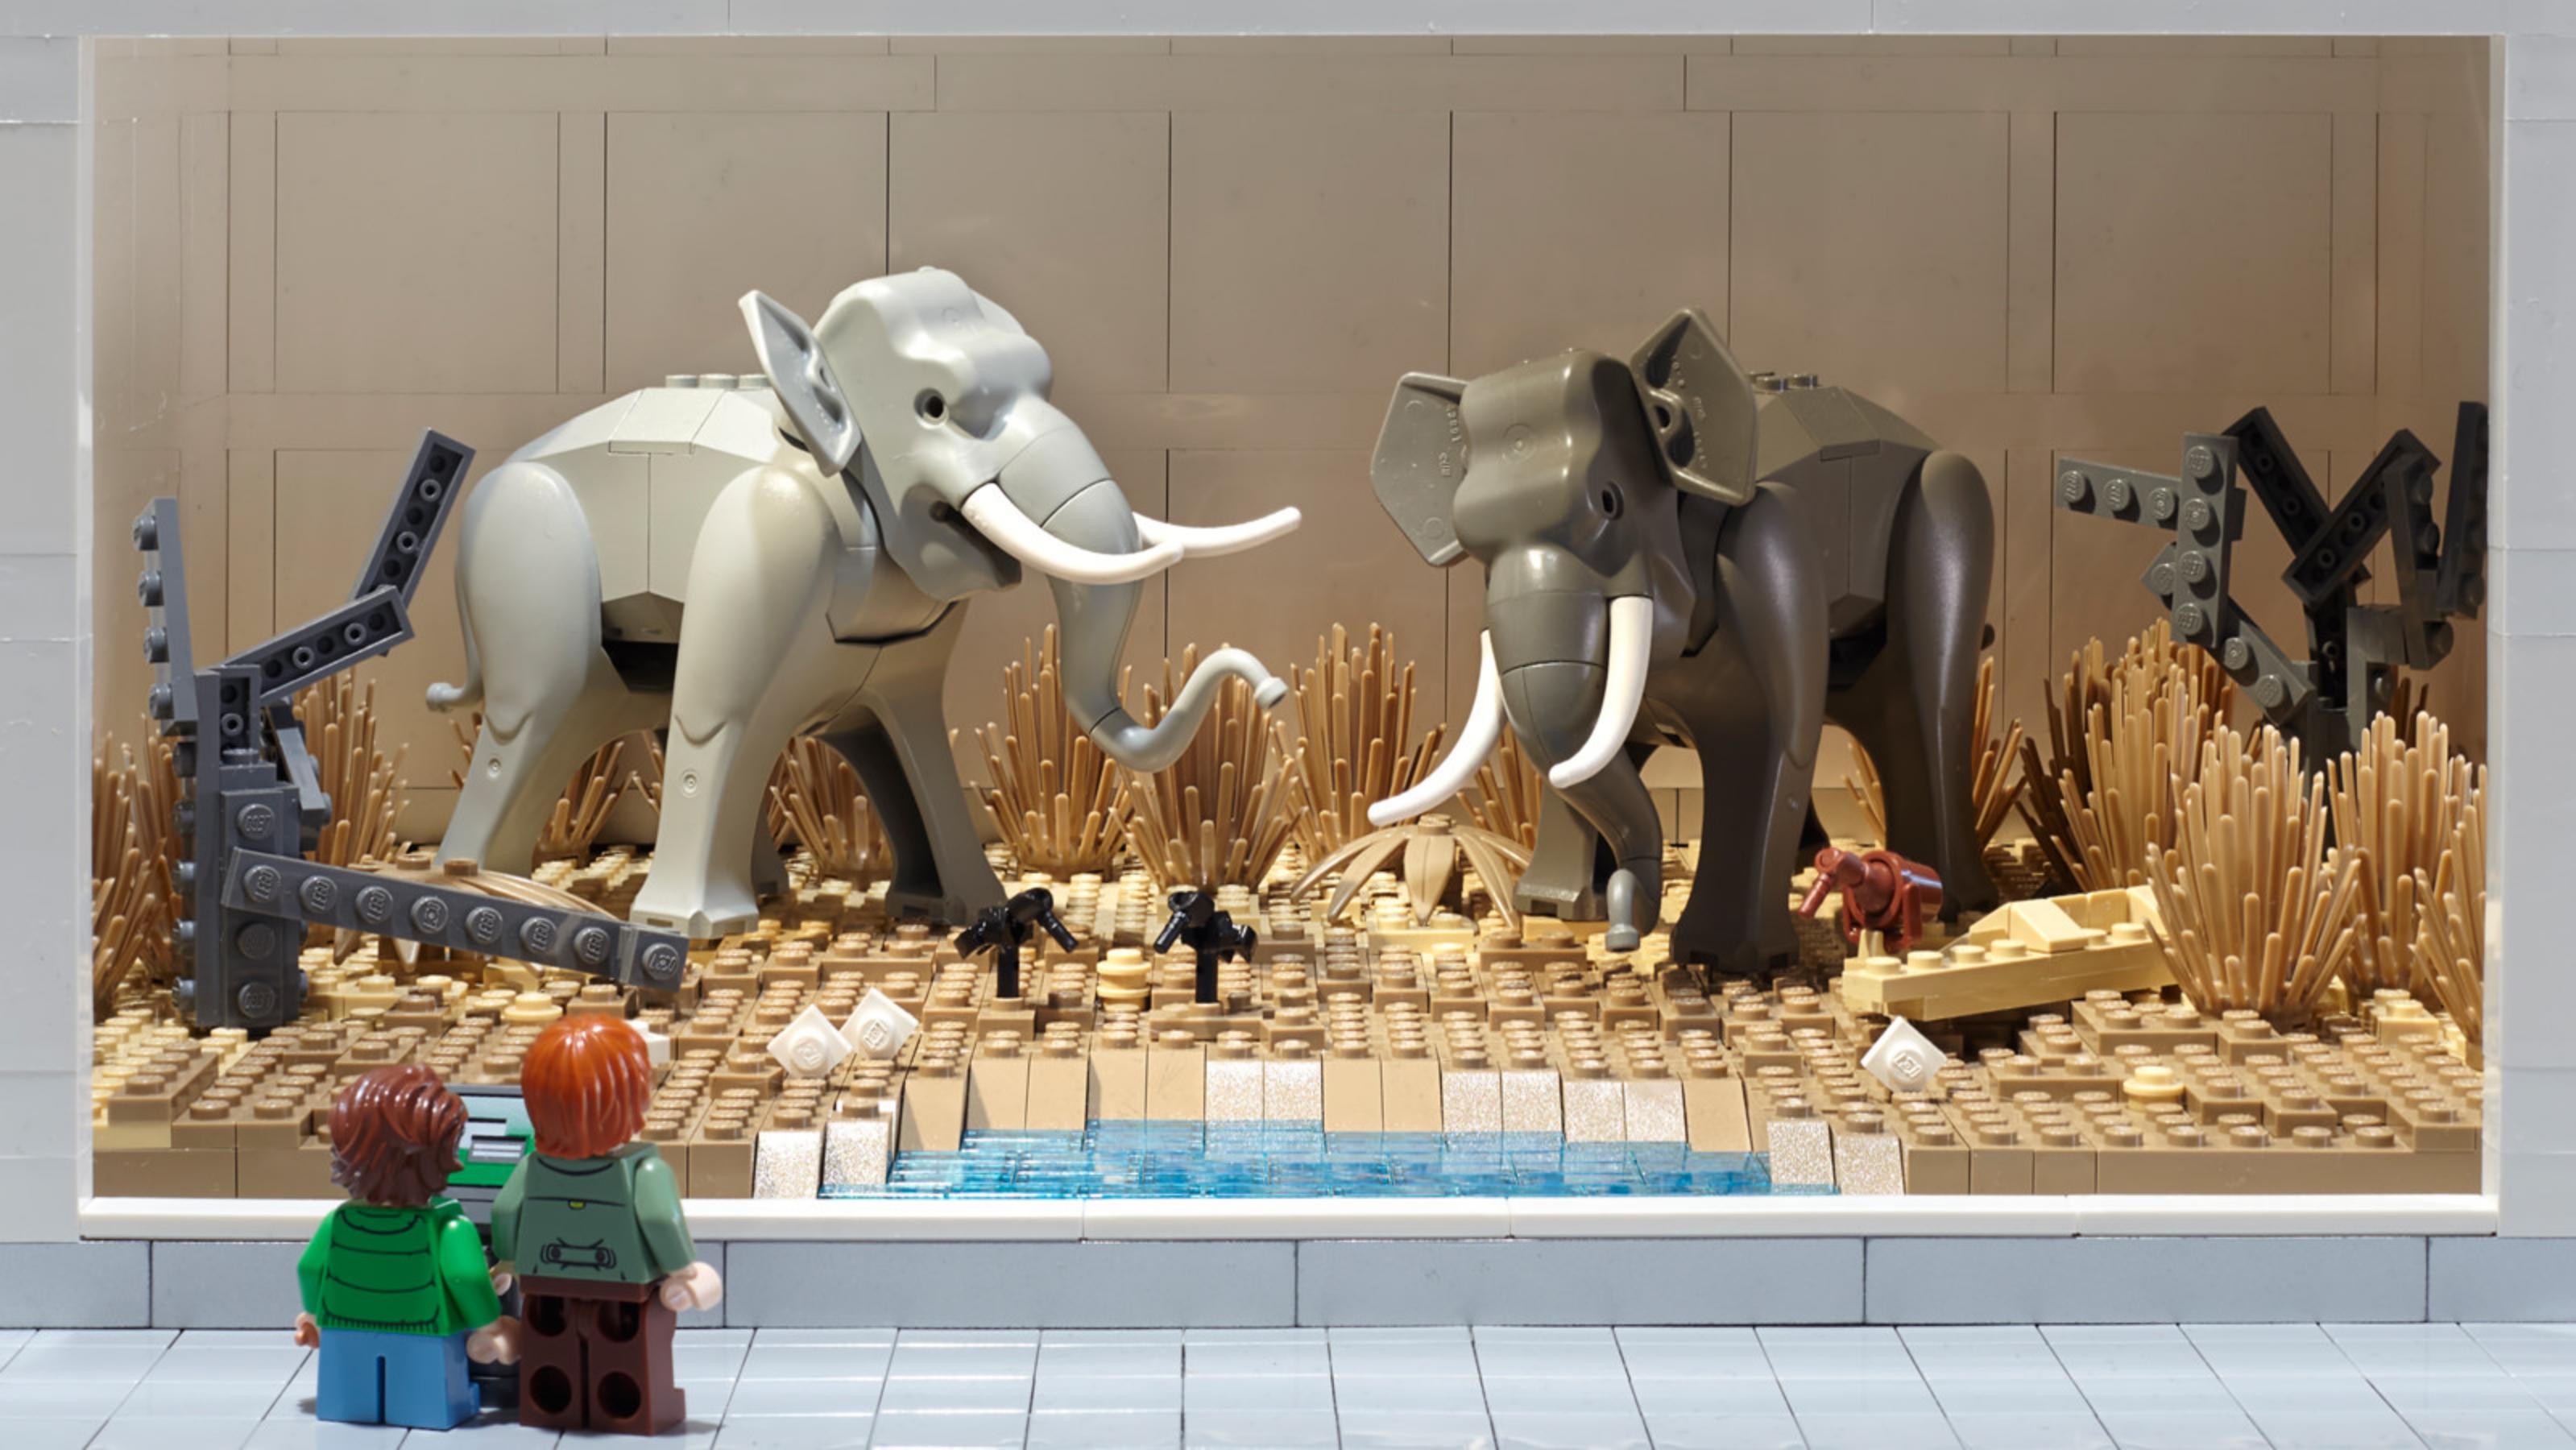 LEGO Olifanten MOC - veel bouwplezier